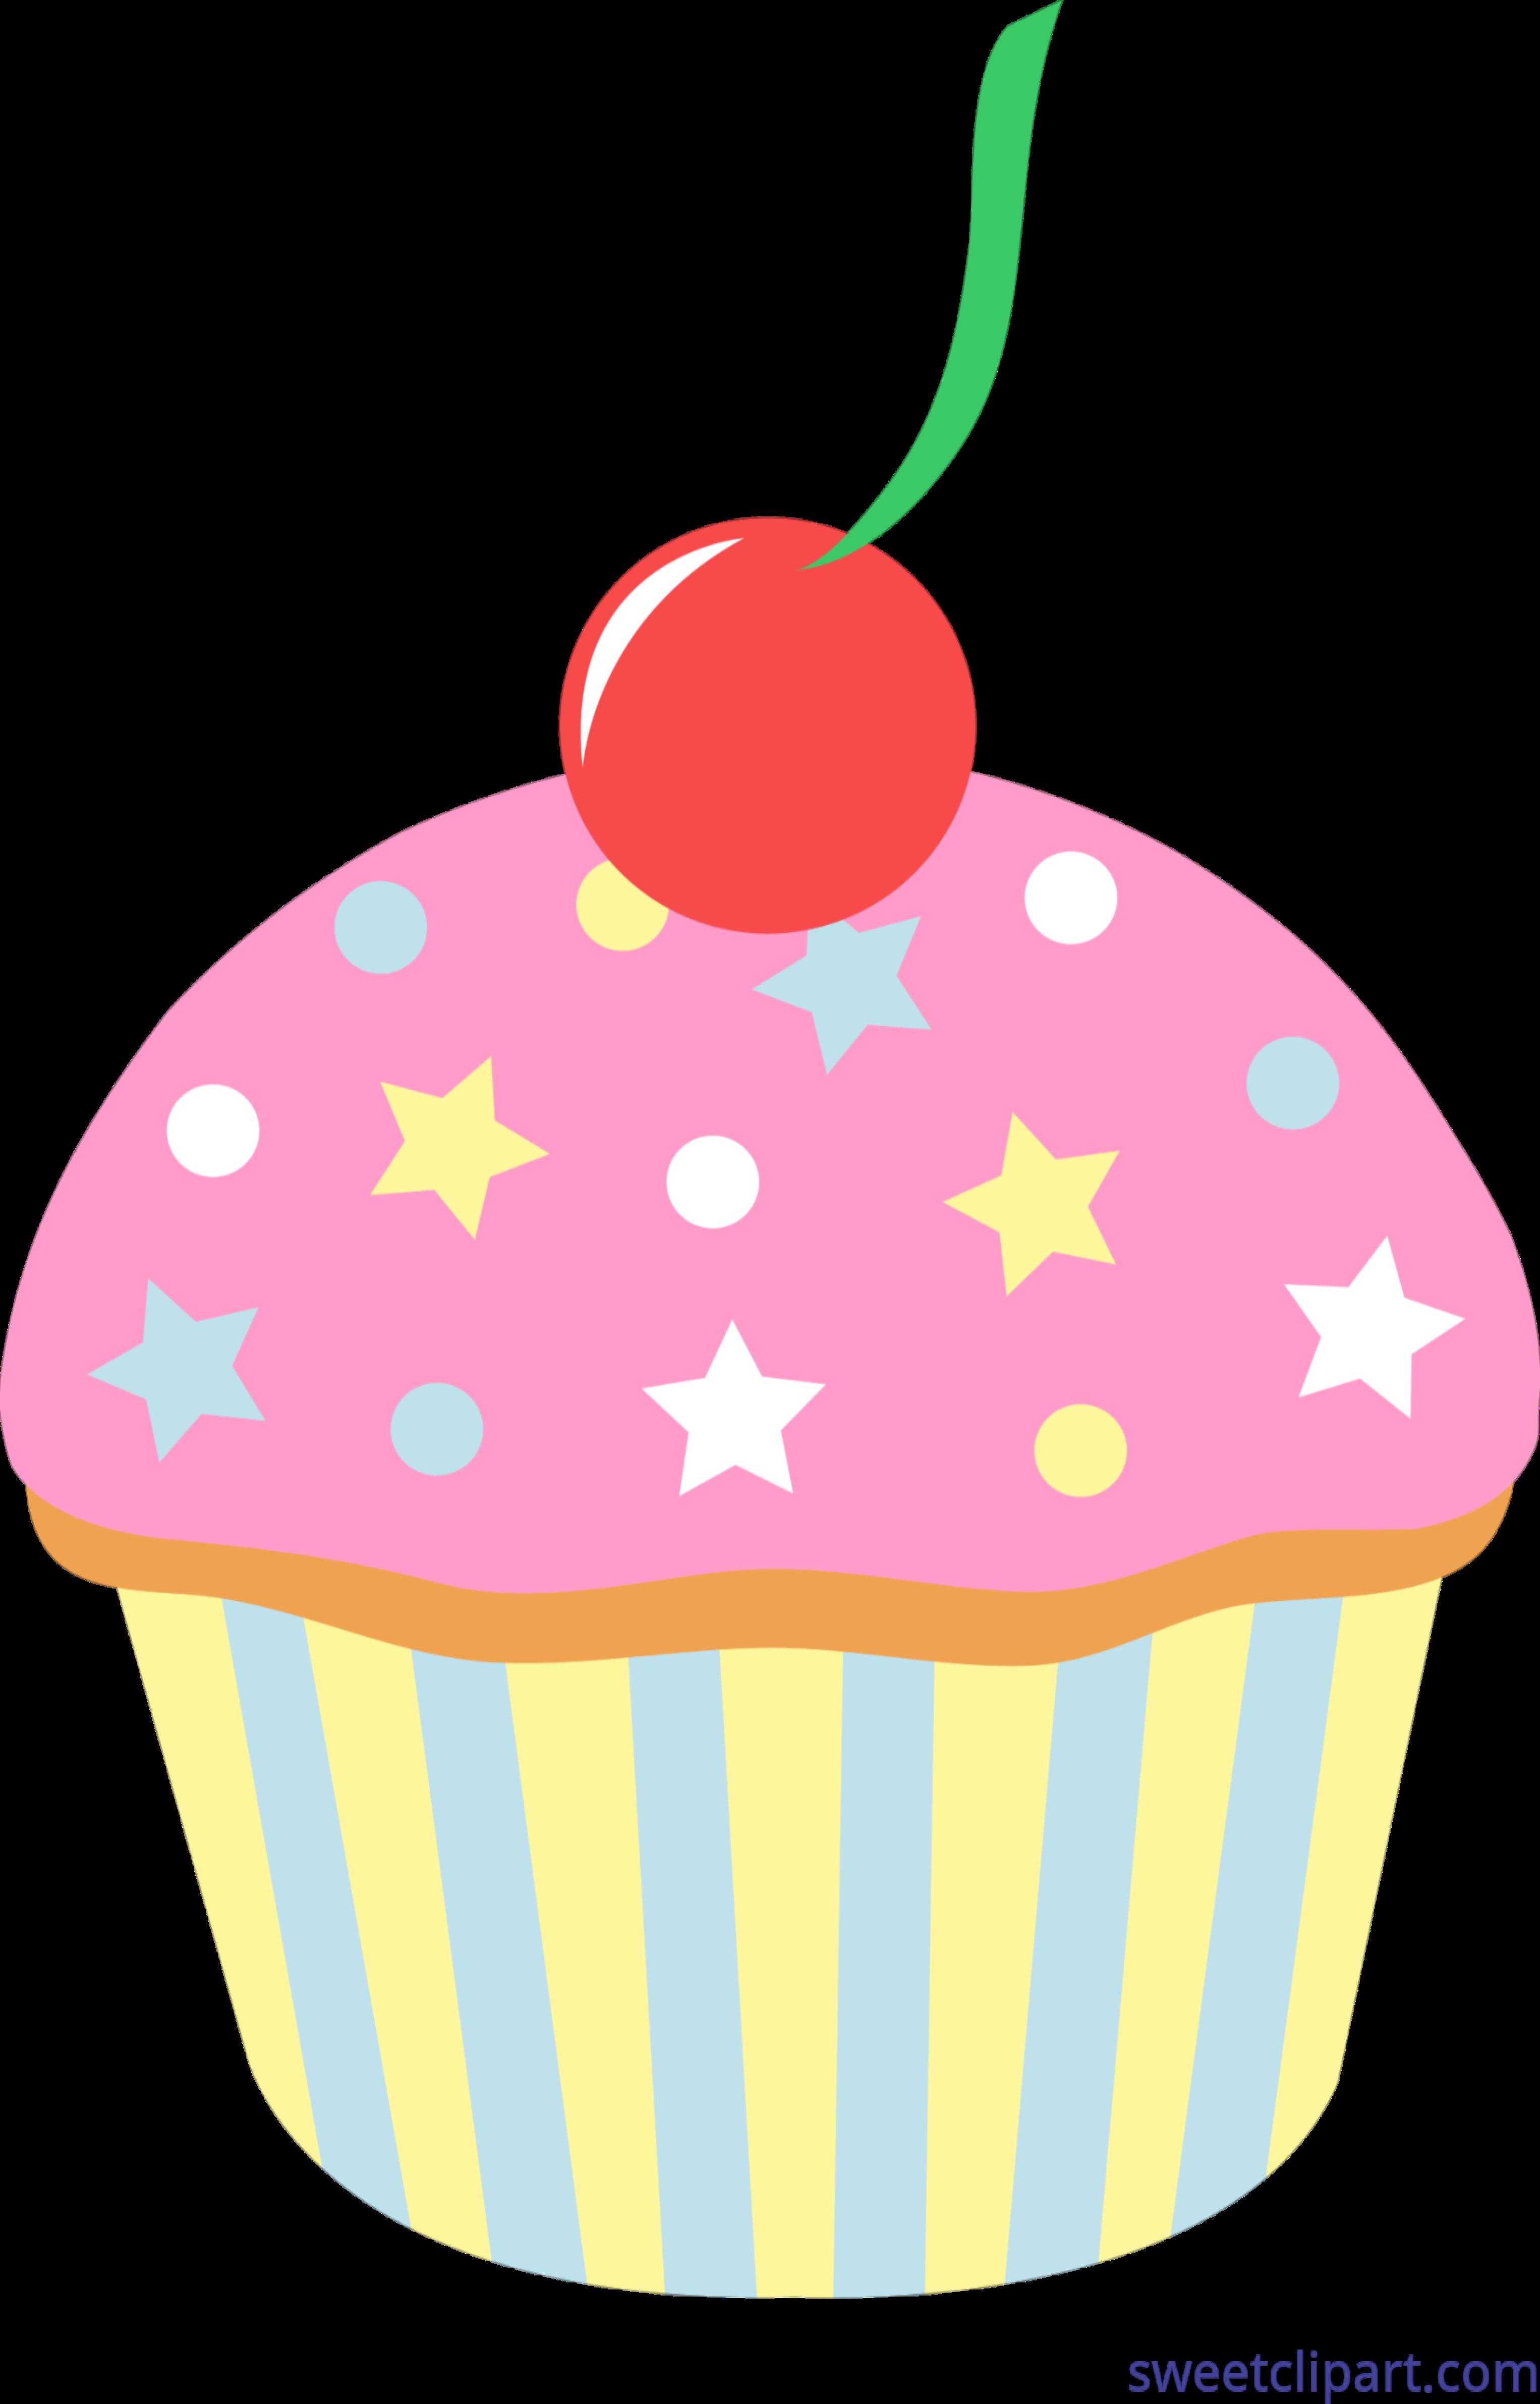 clip art transparent stock Cupcake Strawberry Sprinkles Cherry Clip Art